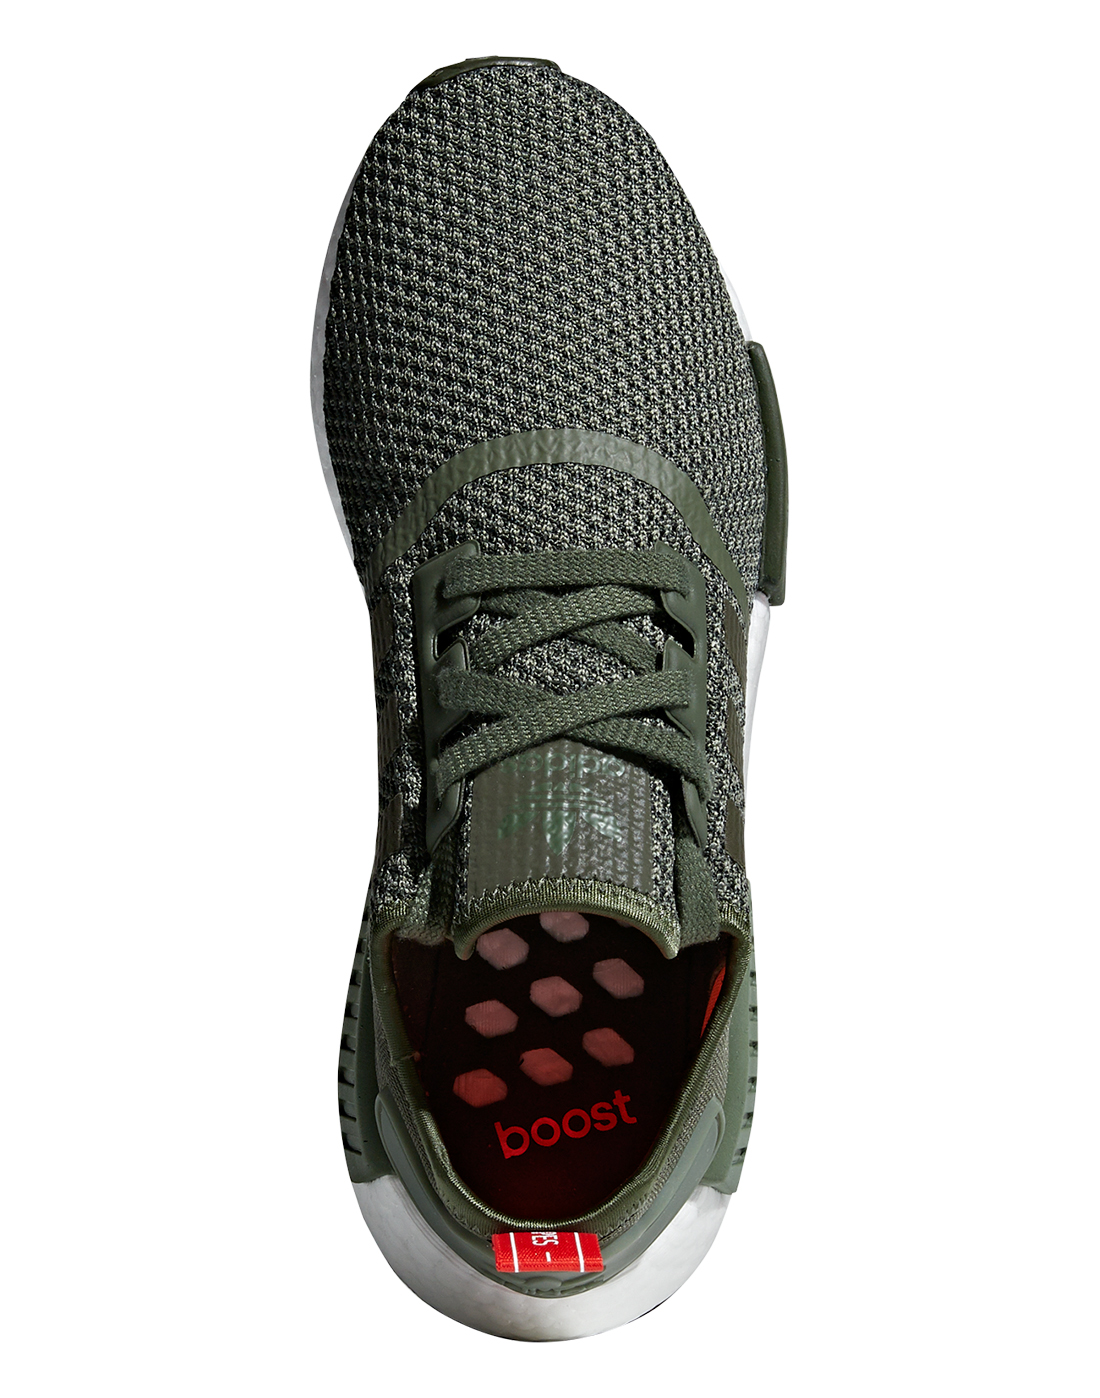 2accf5728 Men s adidas Originals NMD R1